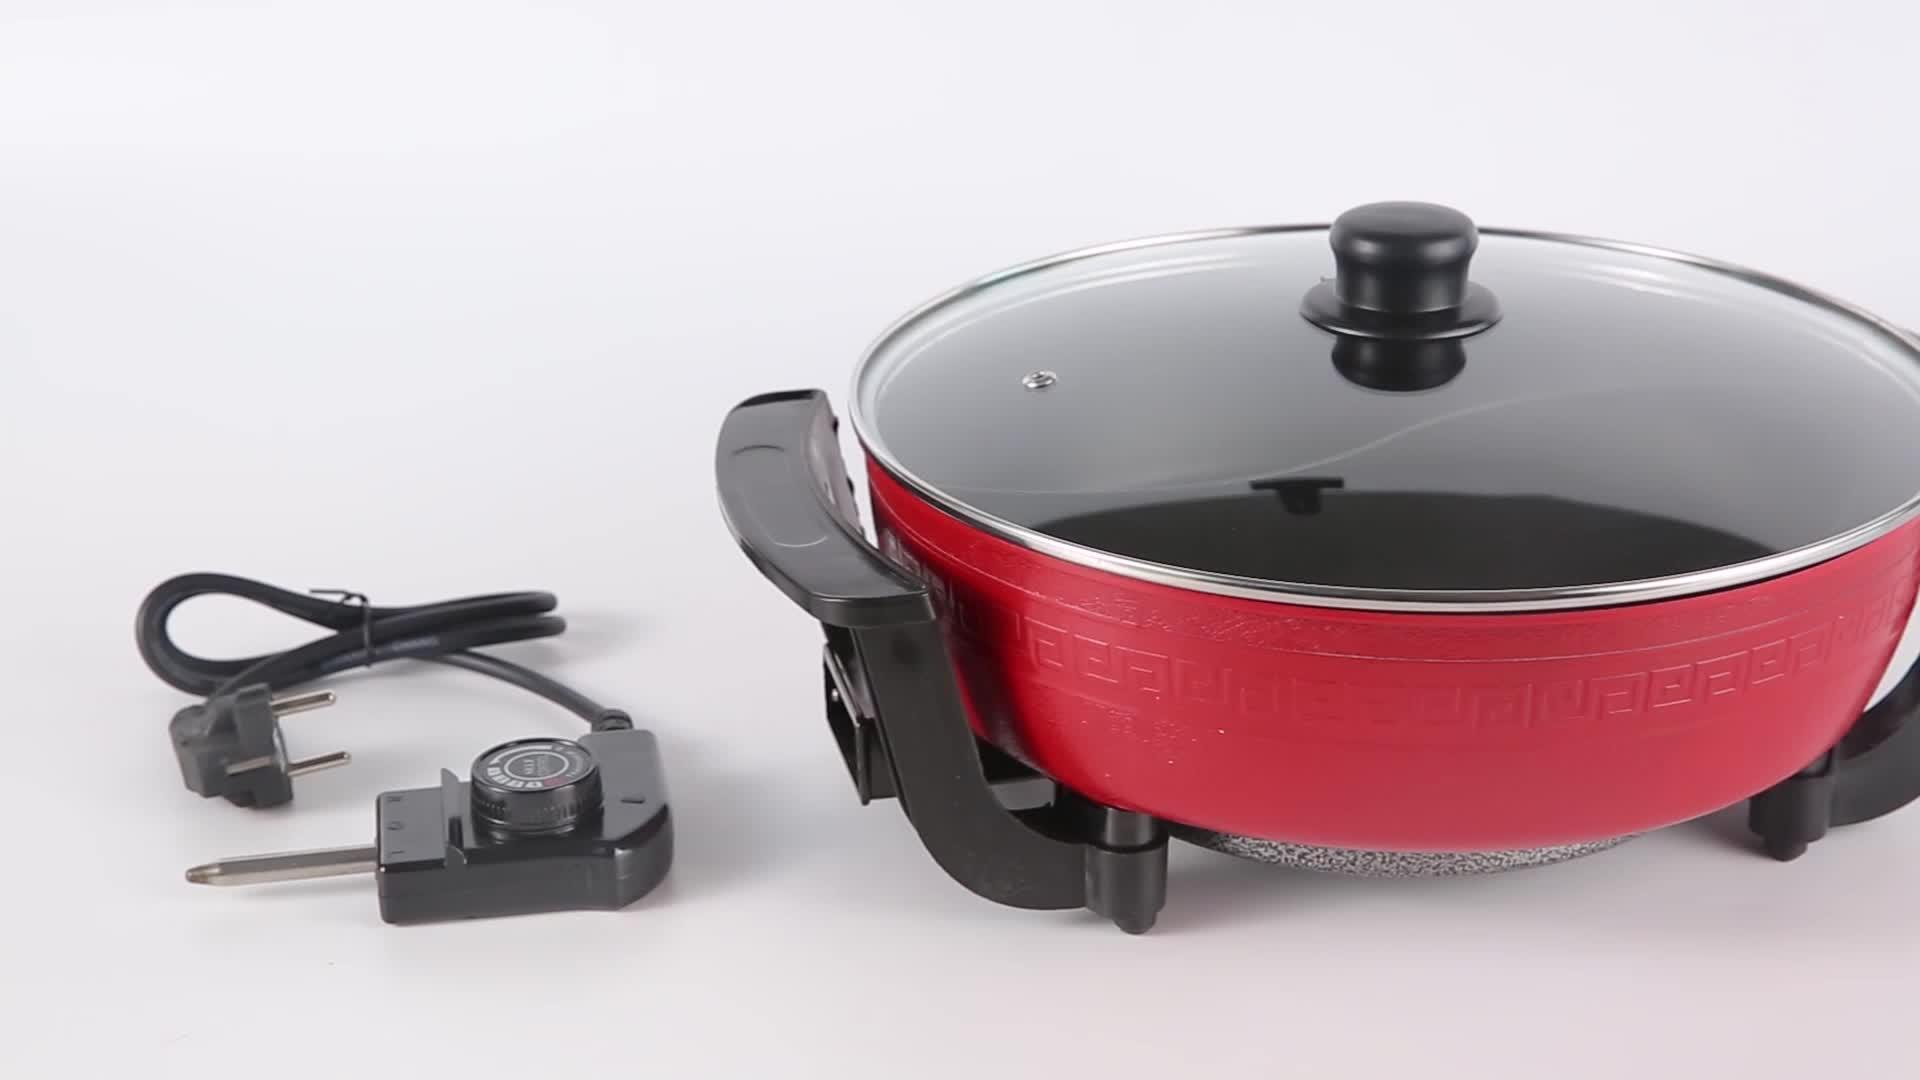 Realbei AL-6022 מיוחד עיצוב בשימוש נרחב חשמלי חם תעשייתי חשמלי מחבת